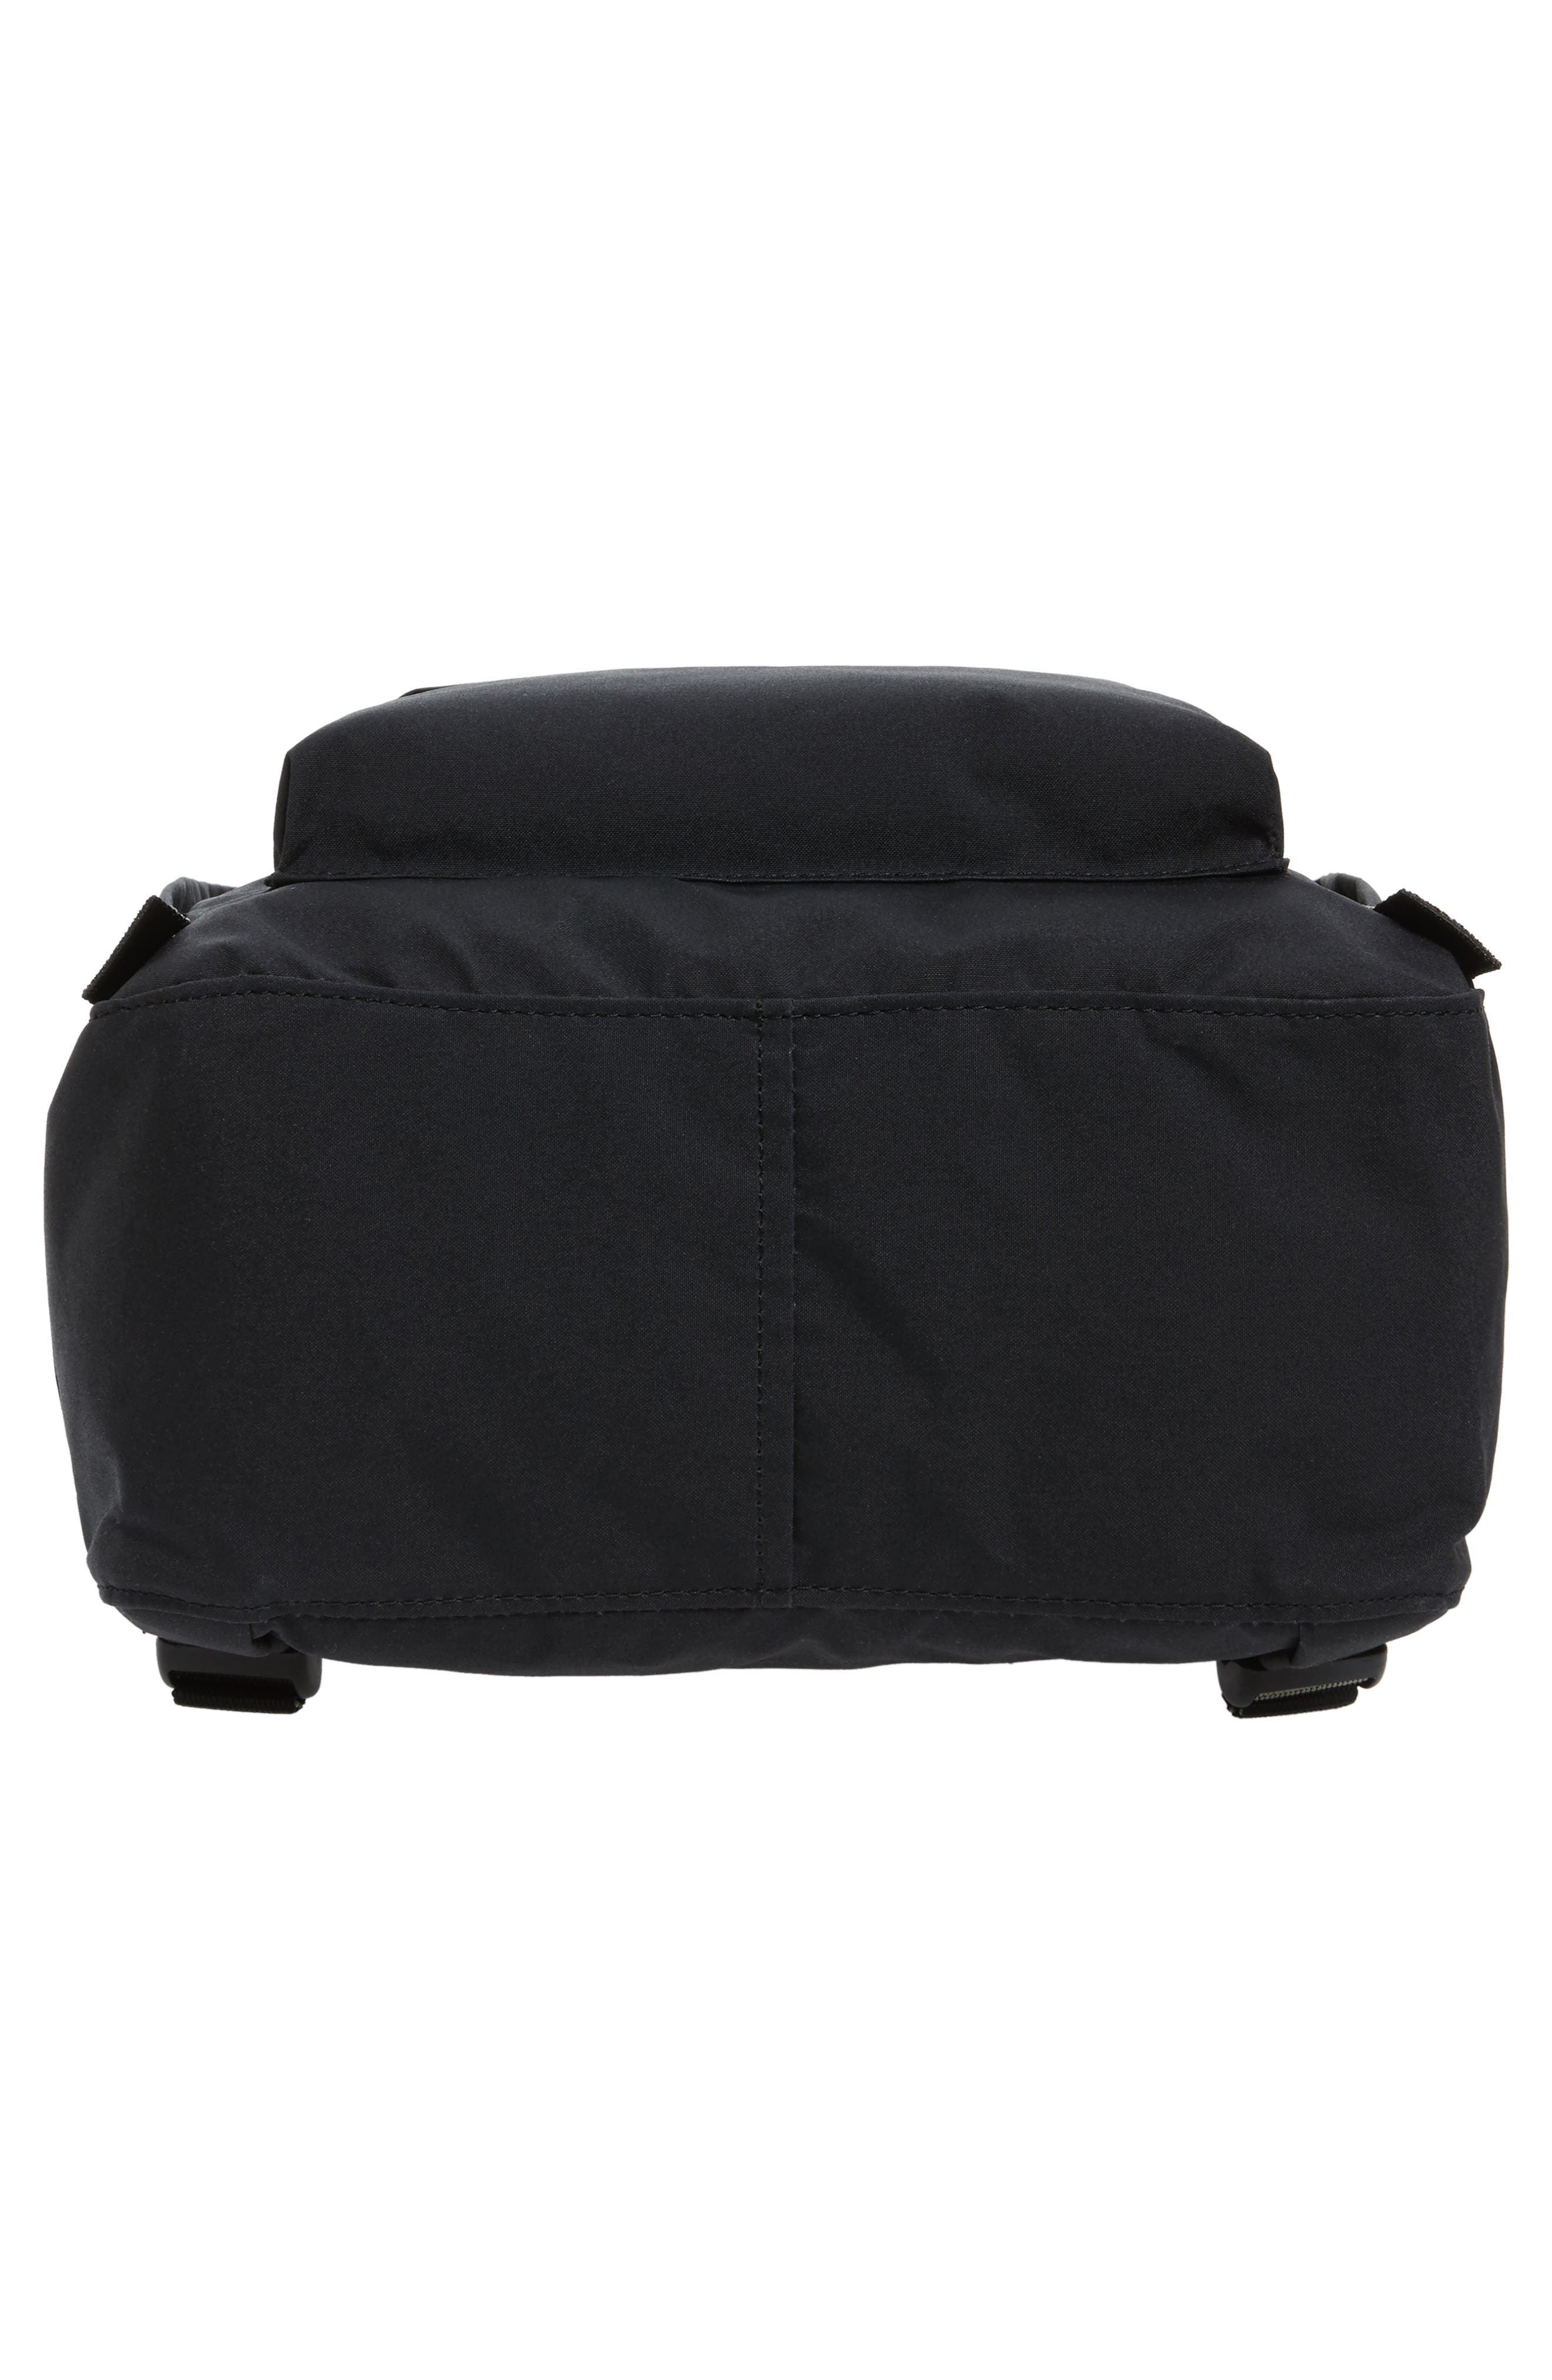 'Kånken' Water Resistant Backpack,                             Alternate thumbnail 302, color,